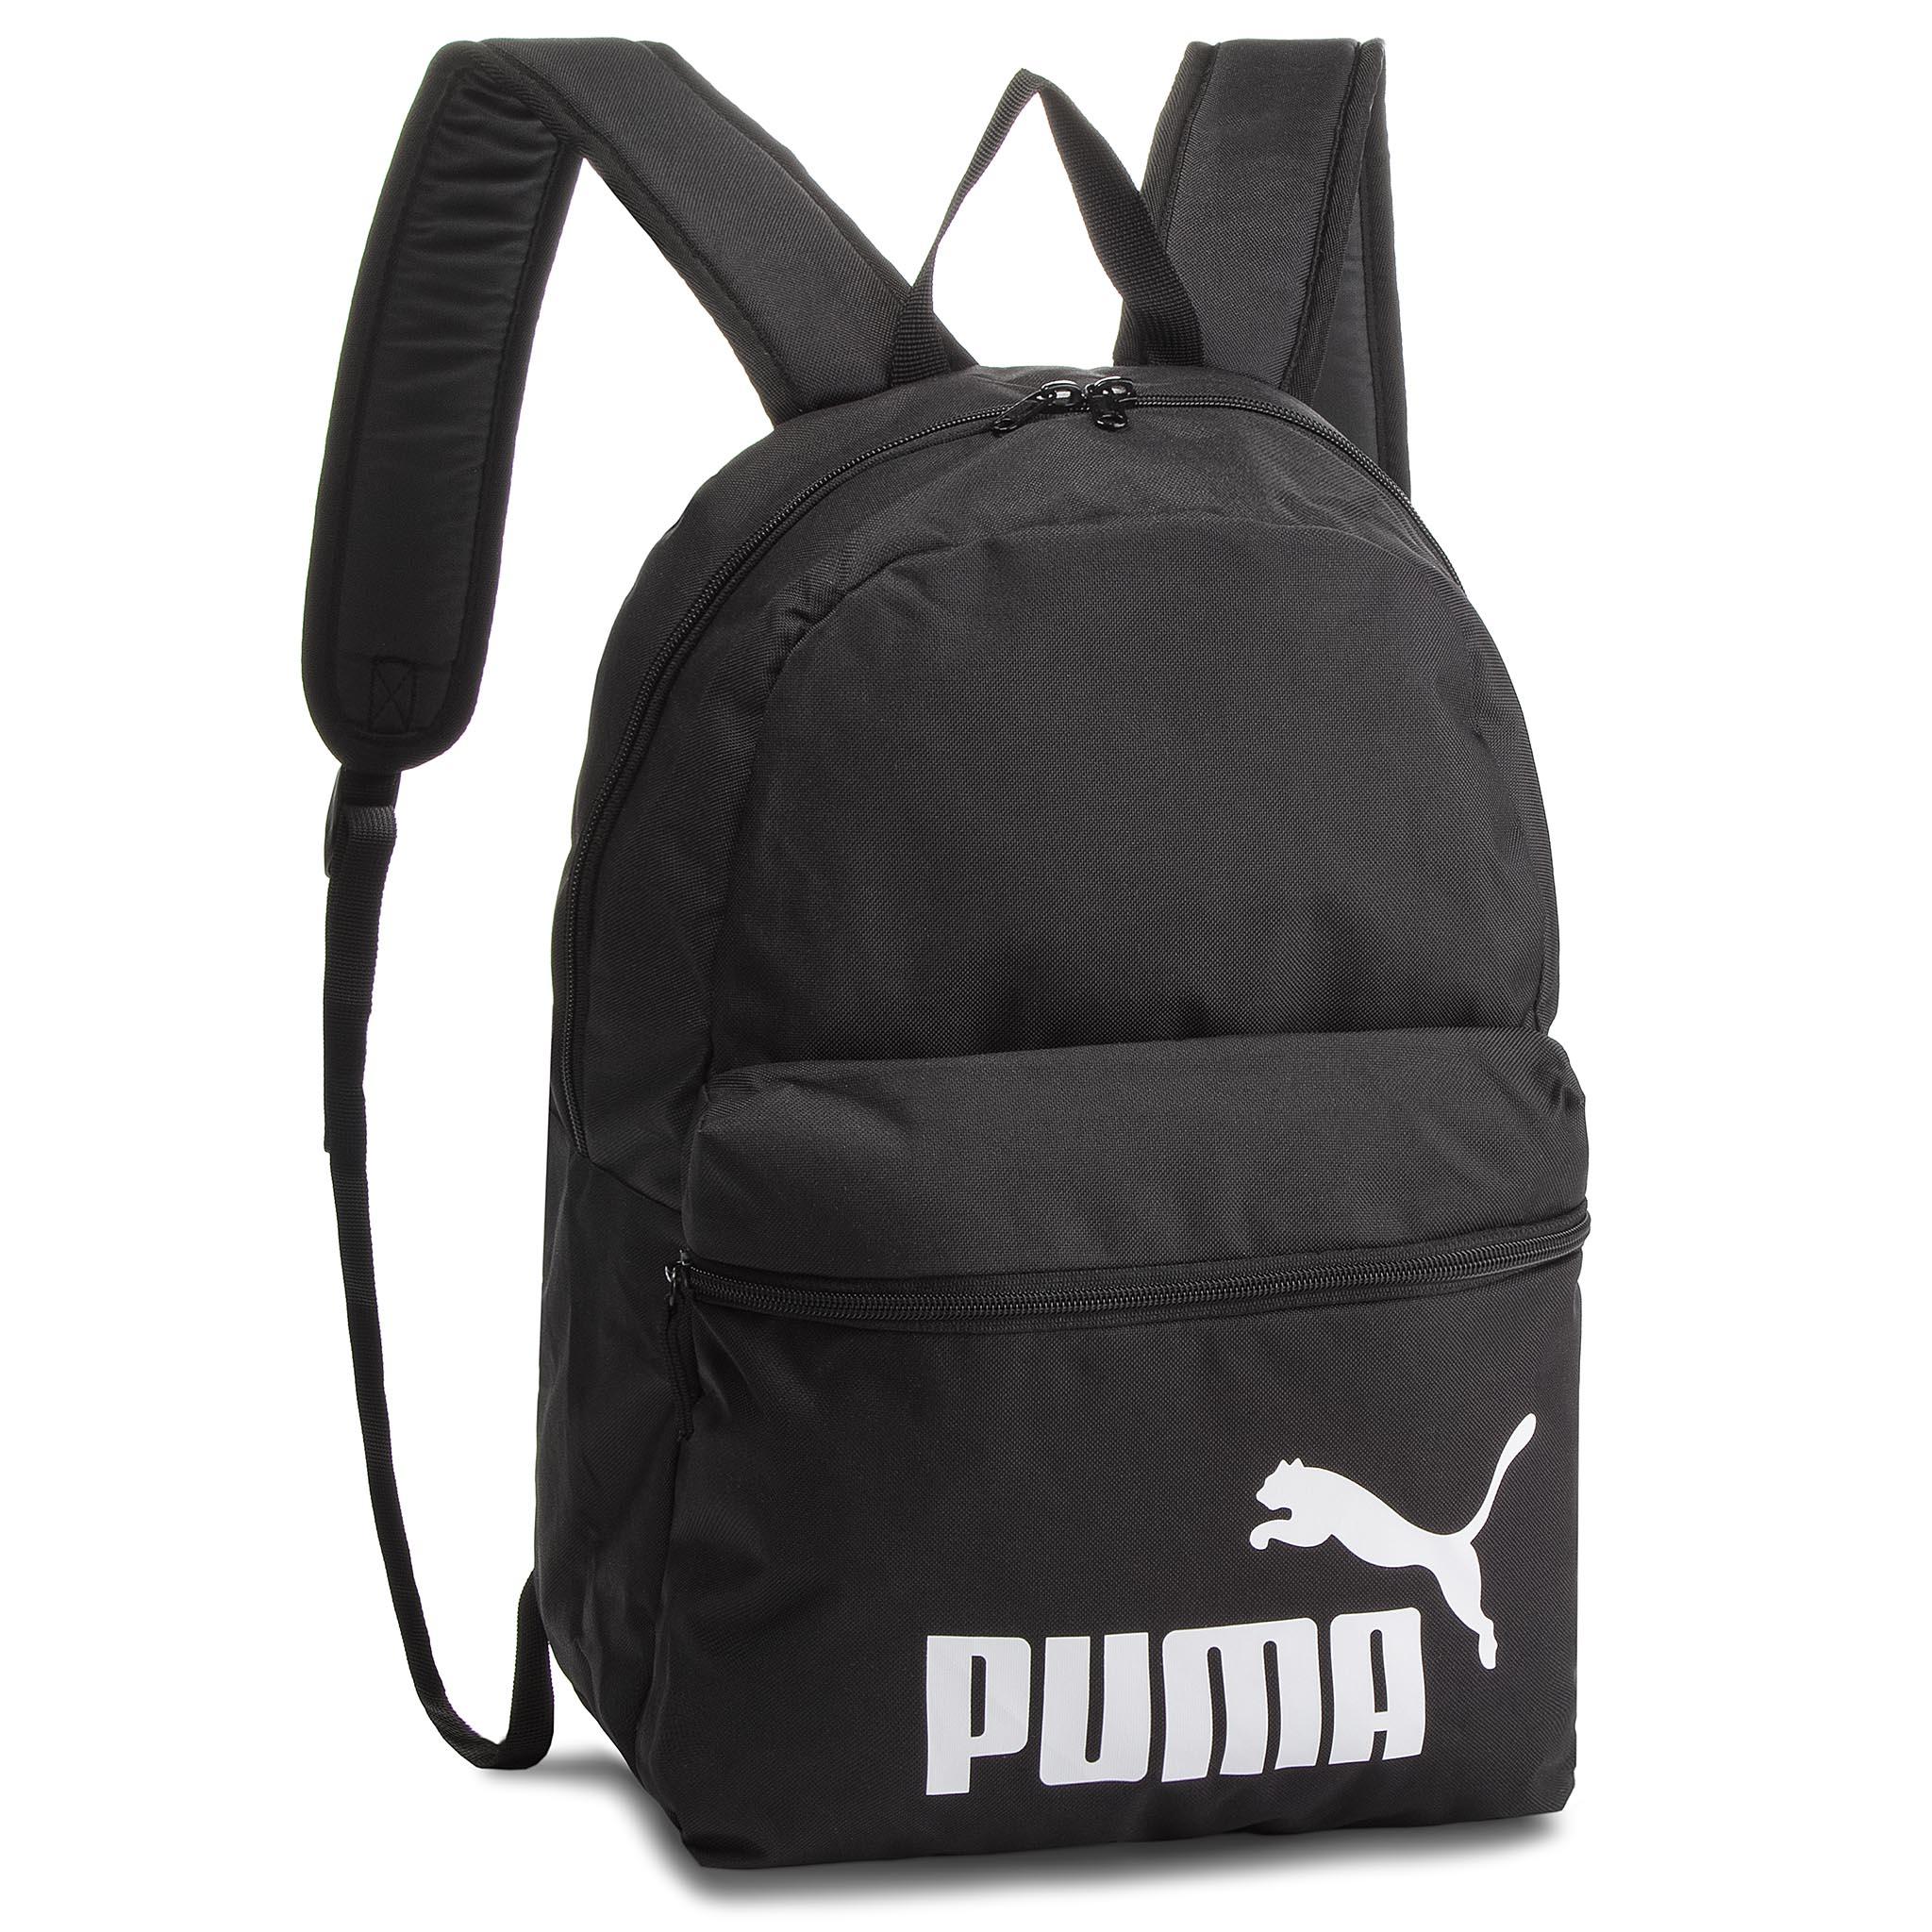 02536793c43d Hátizsák PUMA - Phase Backpack 075487 01 Puma Black - Glami.hu